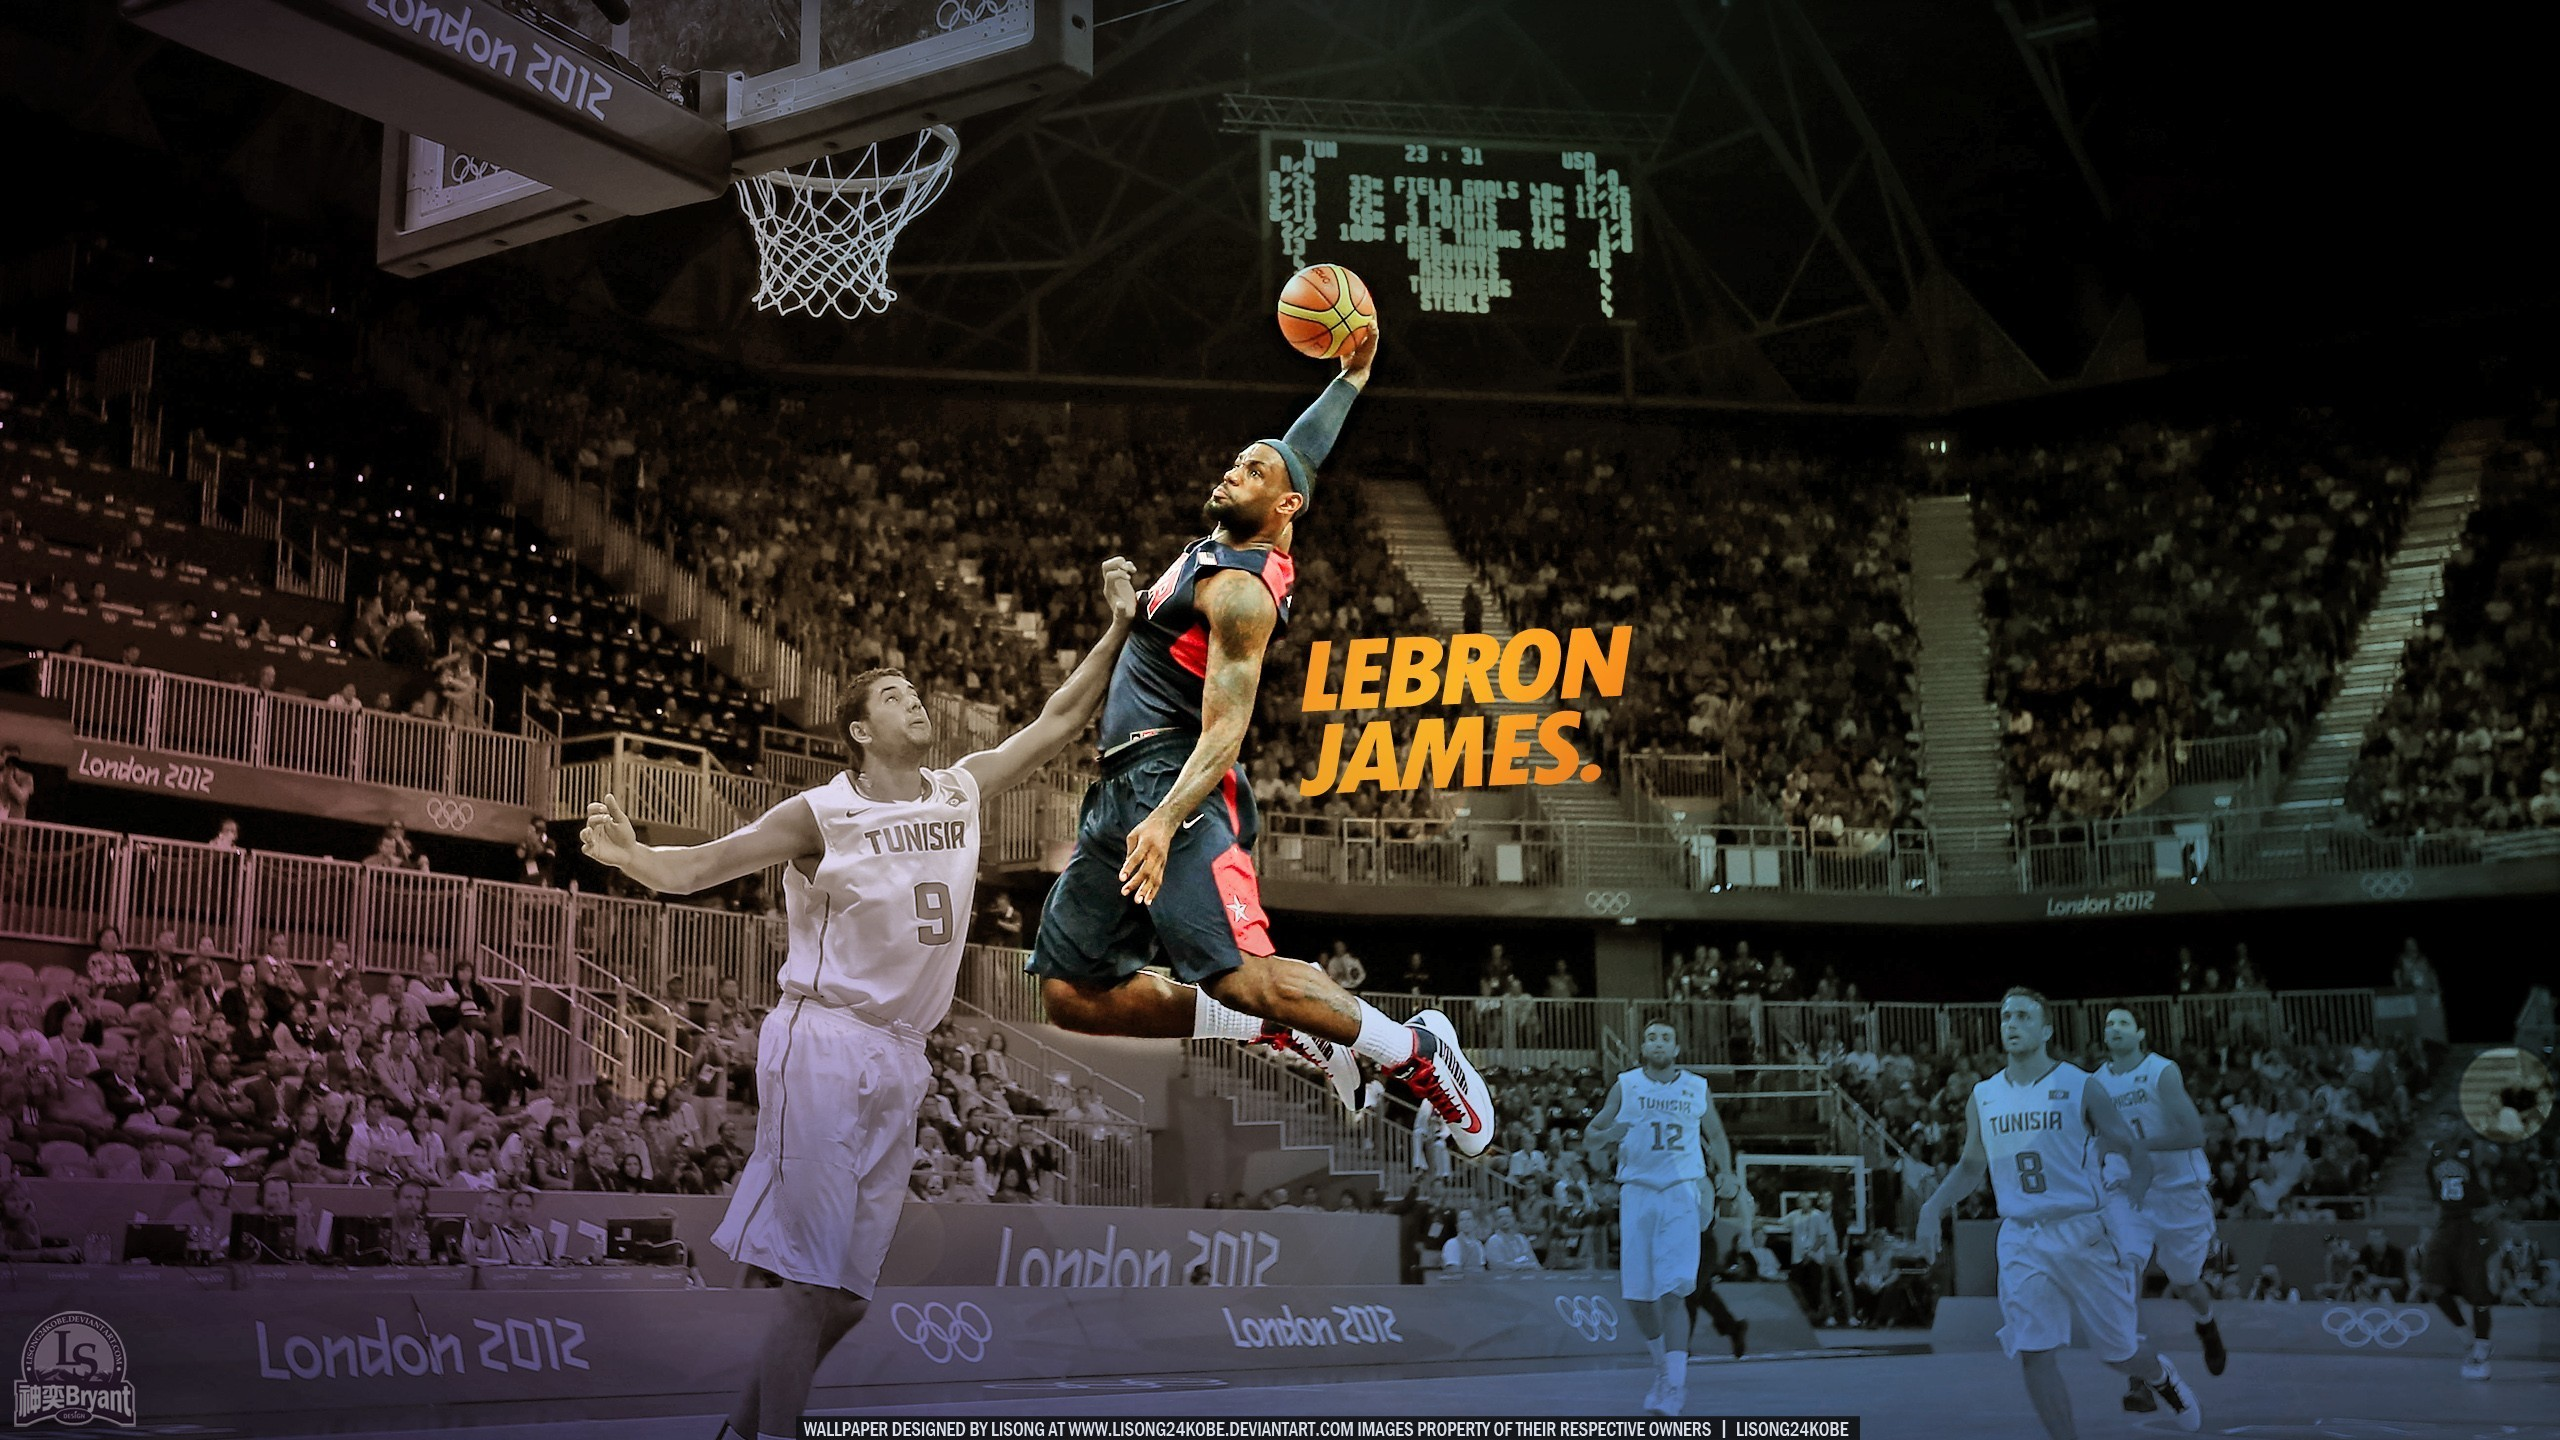 Lebron James Dunk Wallpaper Hd 76 Images